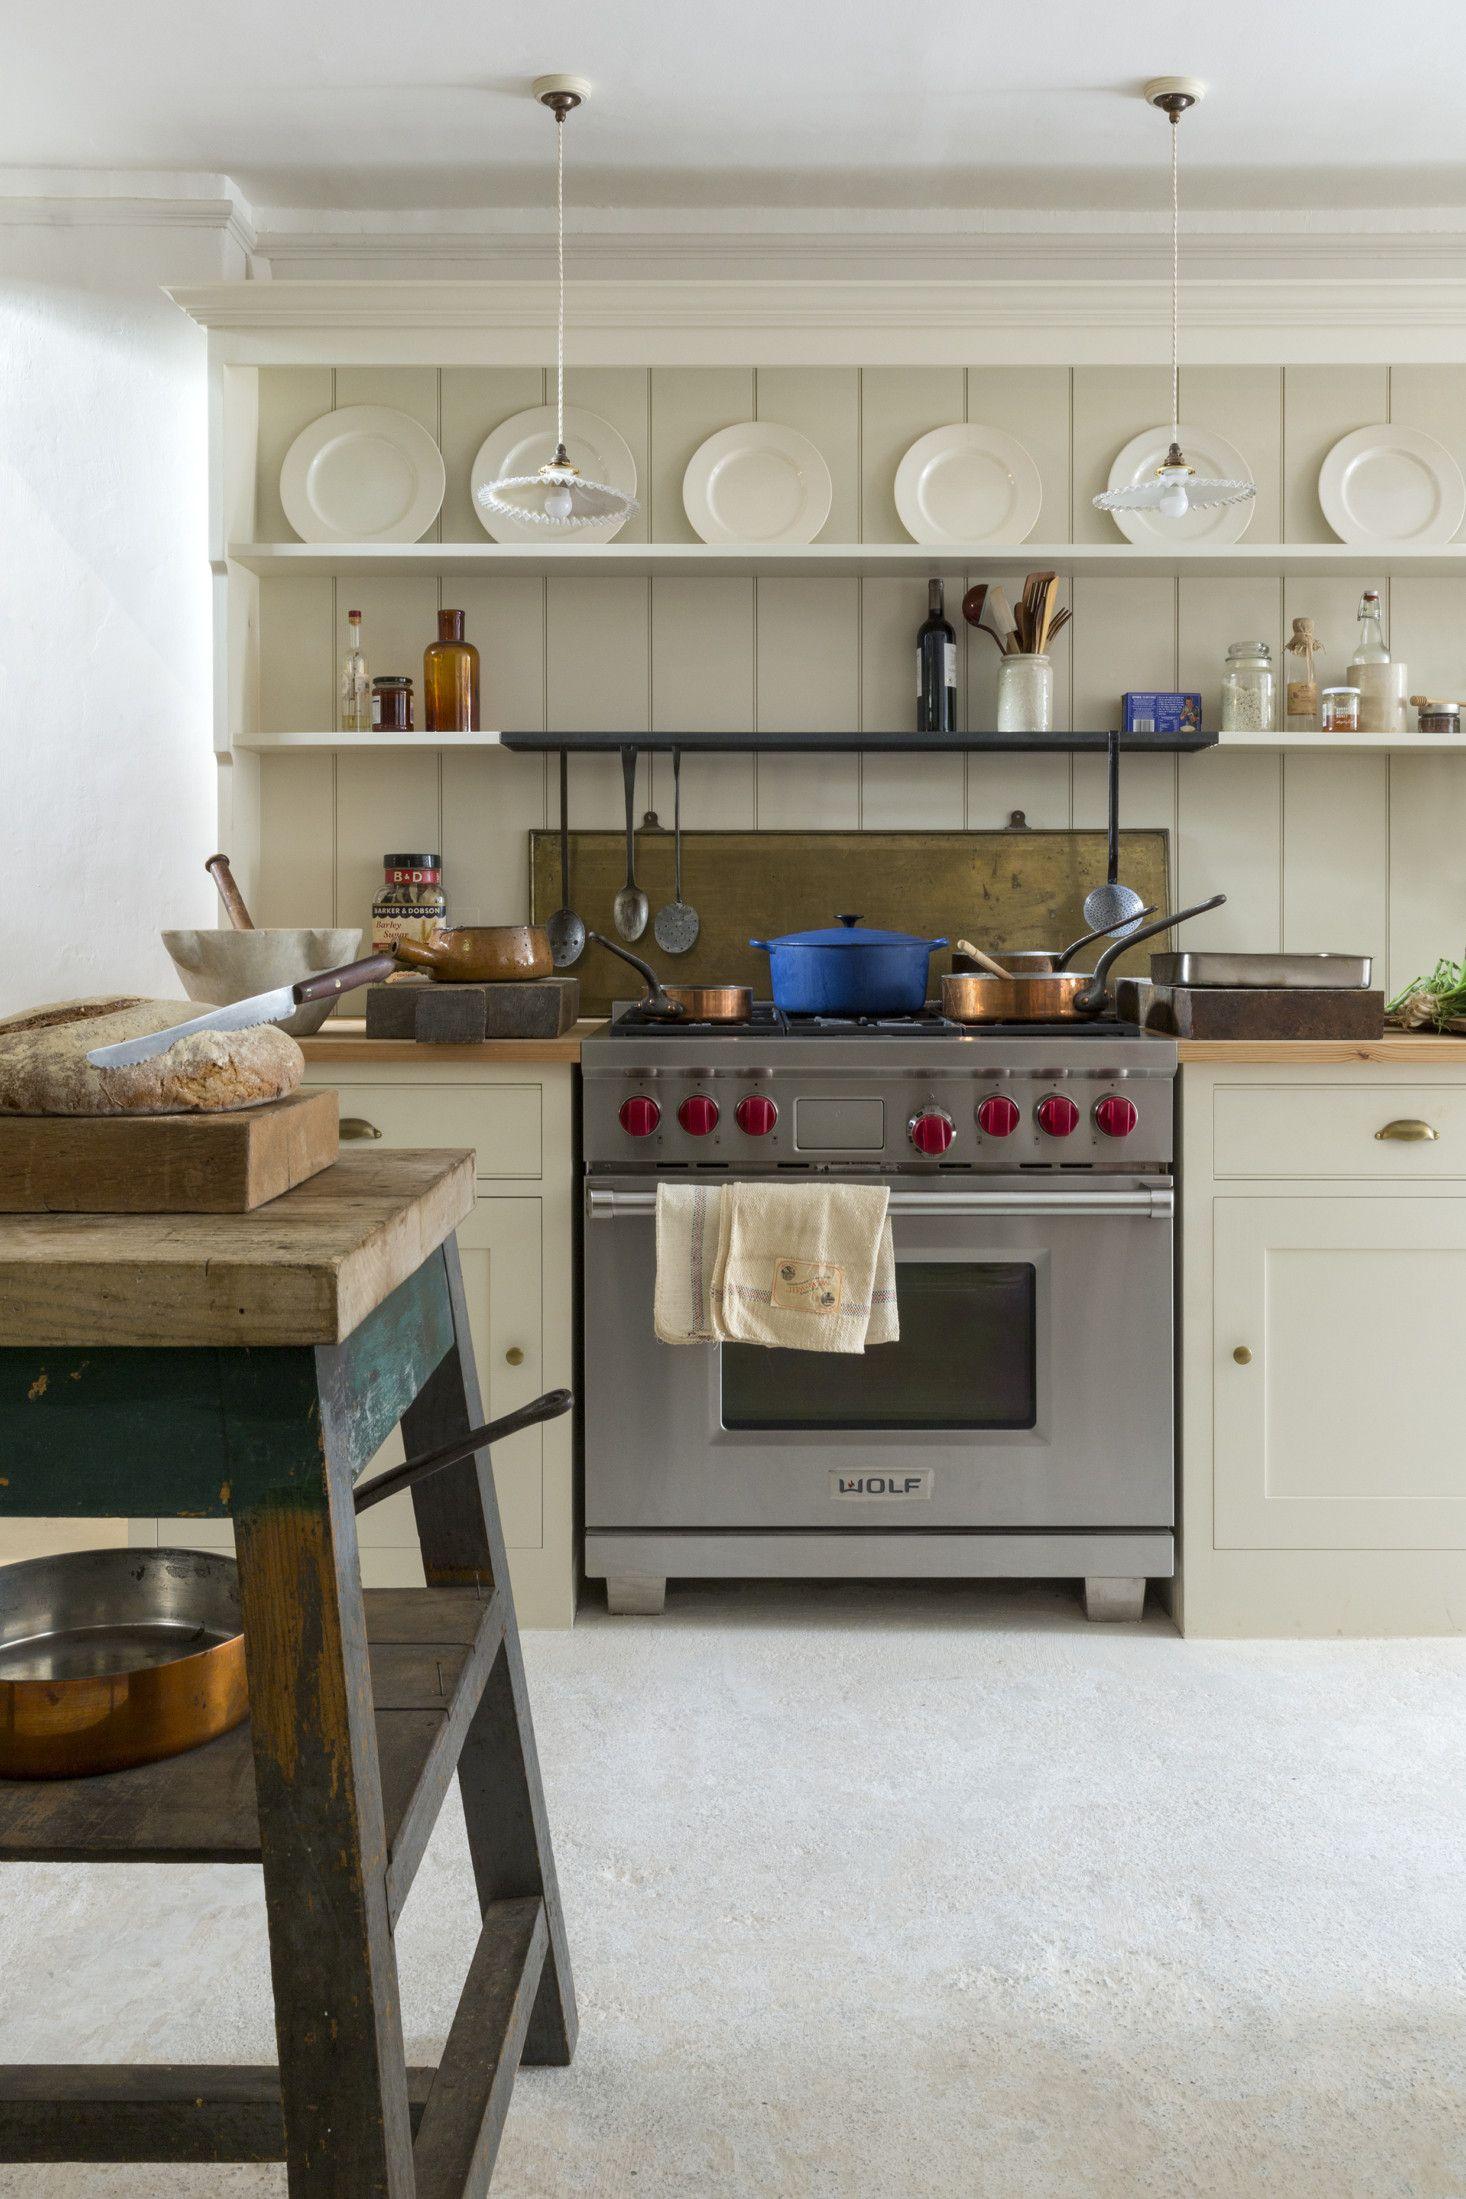 Classic English Kitchen Design By Plain English At Howe London English Kitchens Design Plain English Kitchen Kitchen Design